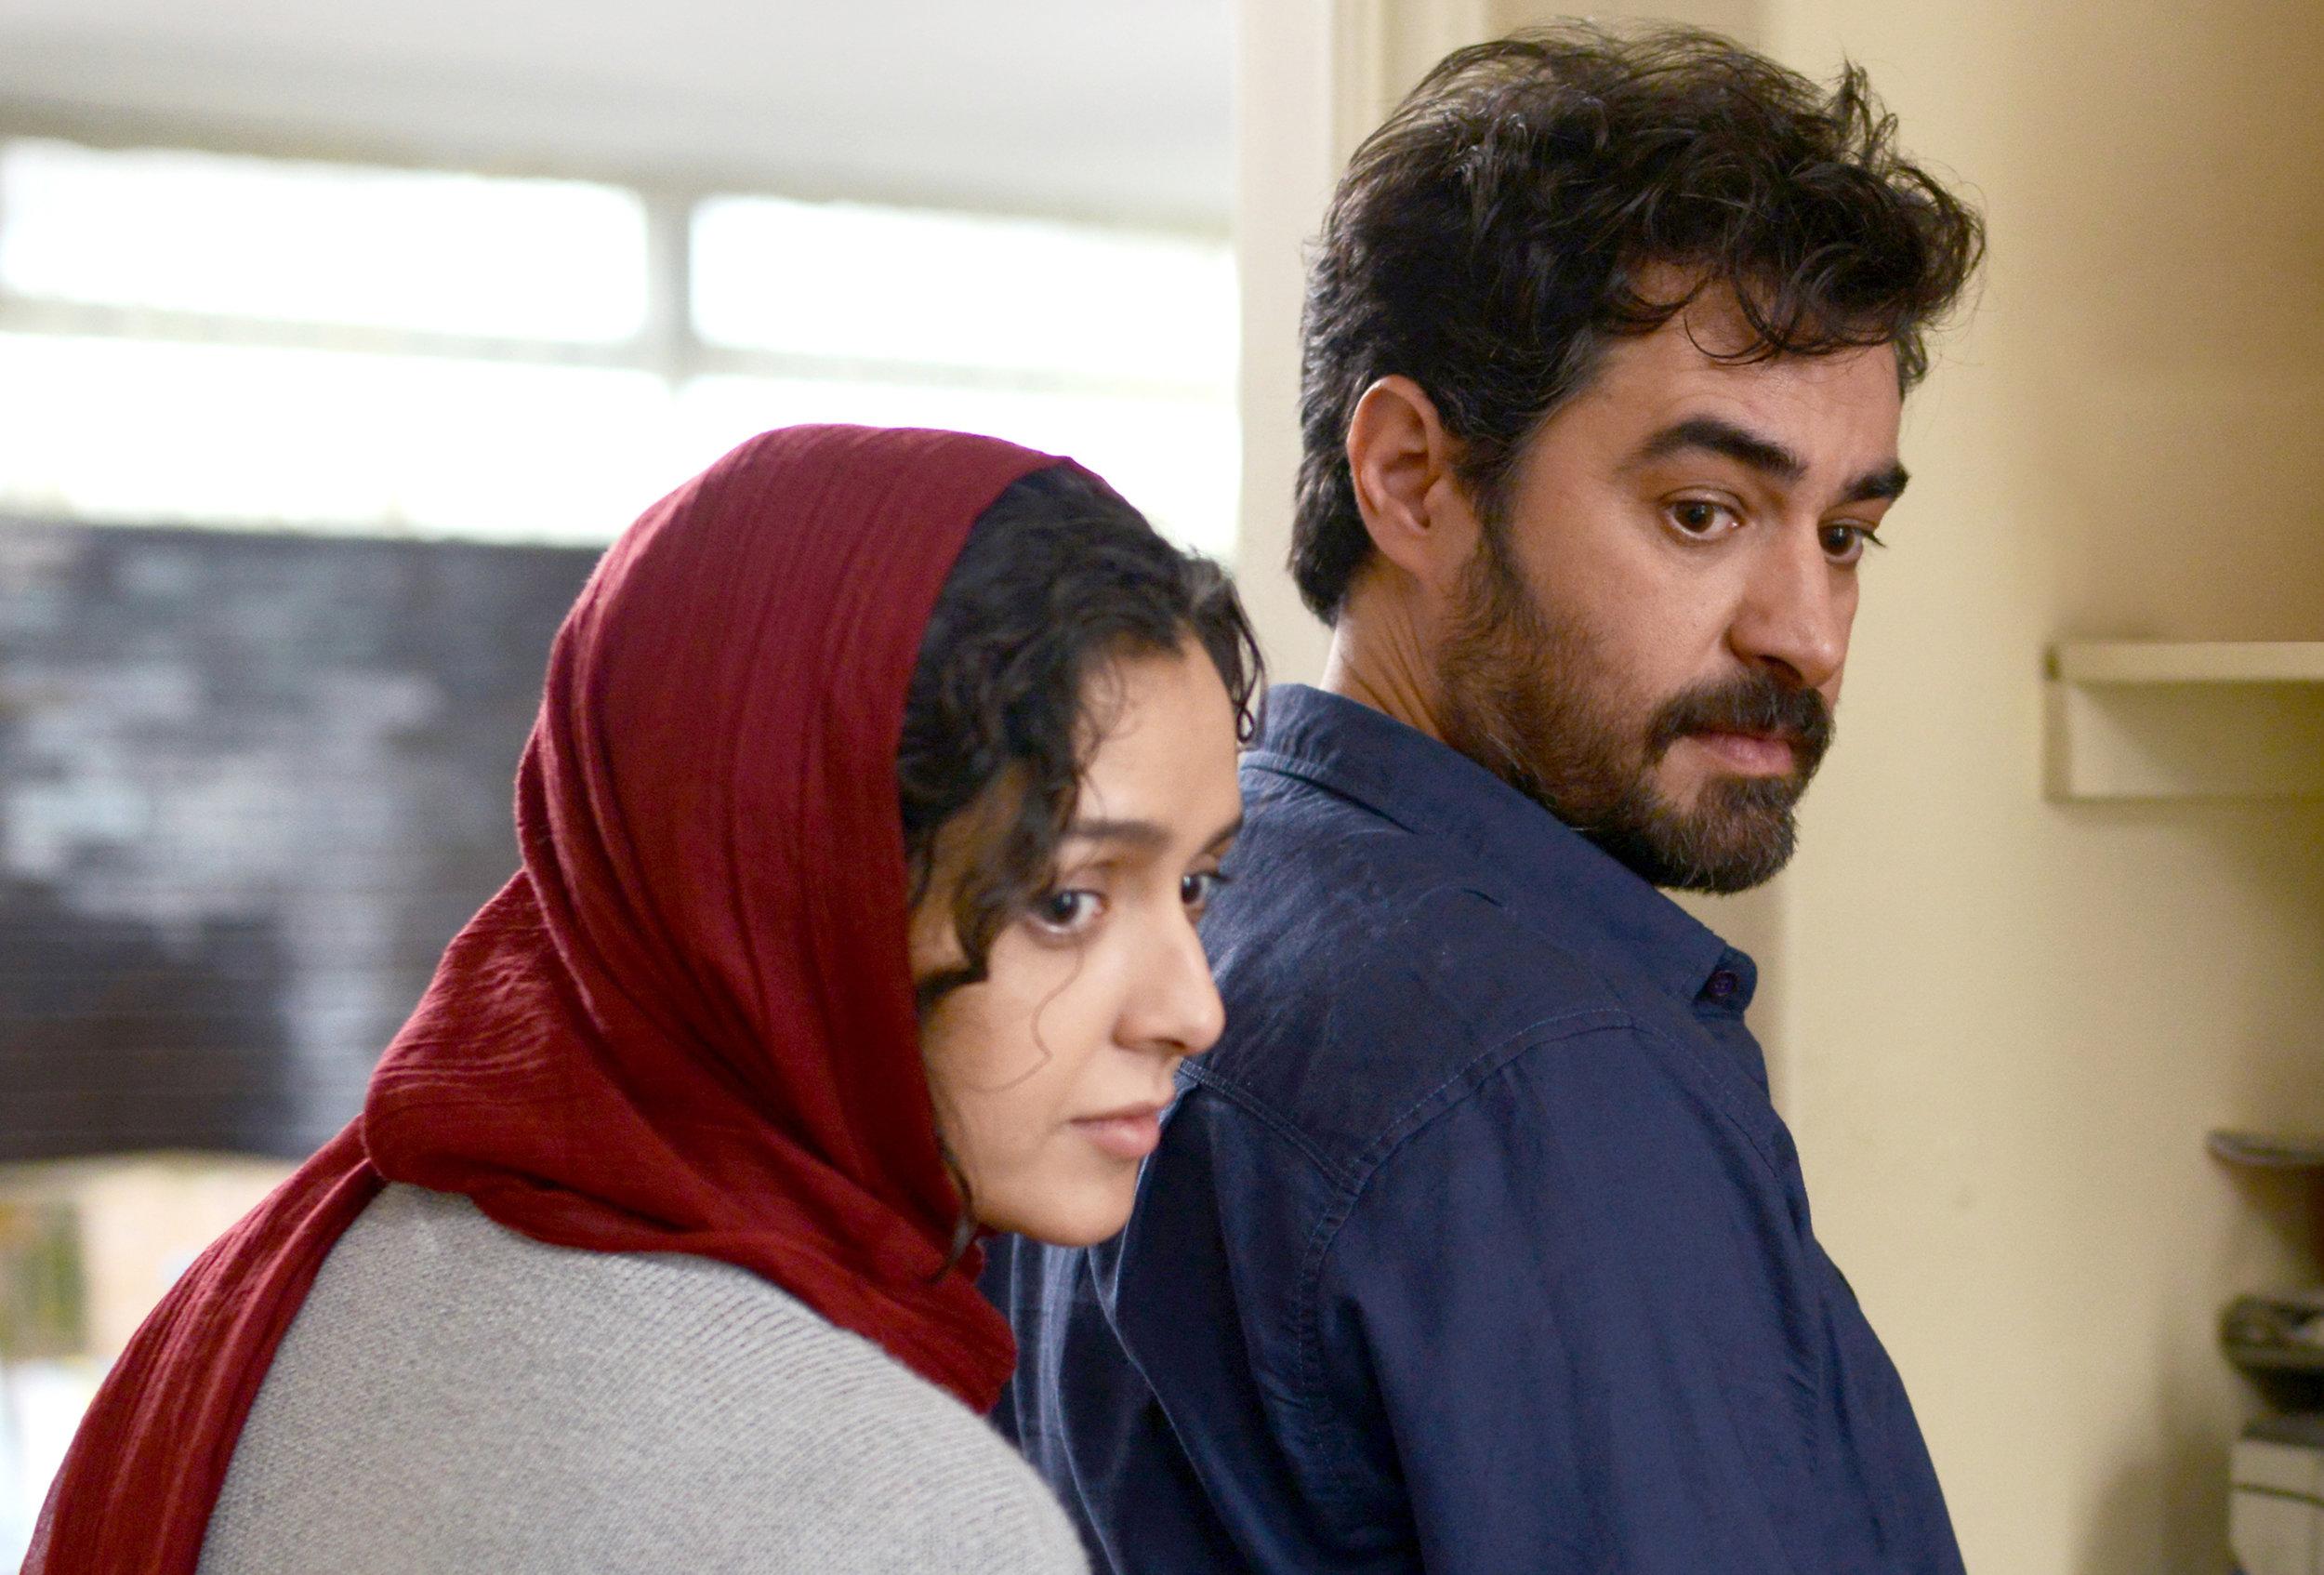 Taraneh Alidoosti and Shahb Hosseini as Rana and Emad in  The Salesman